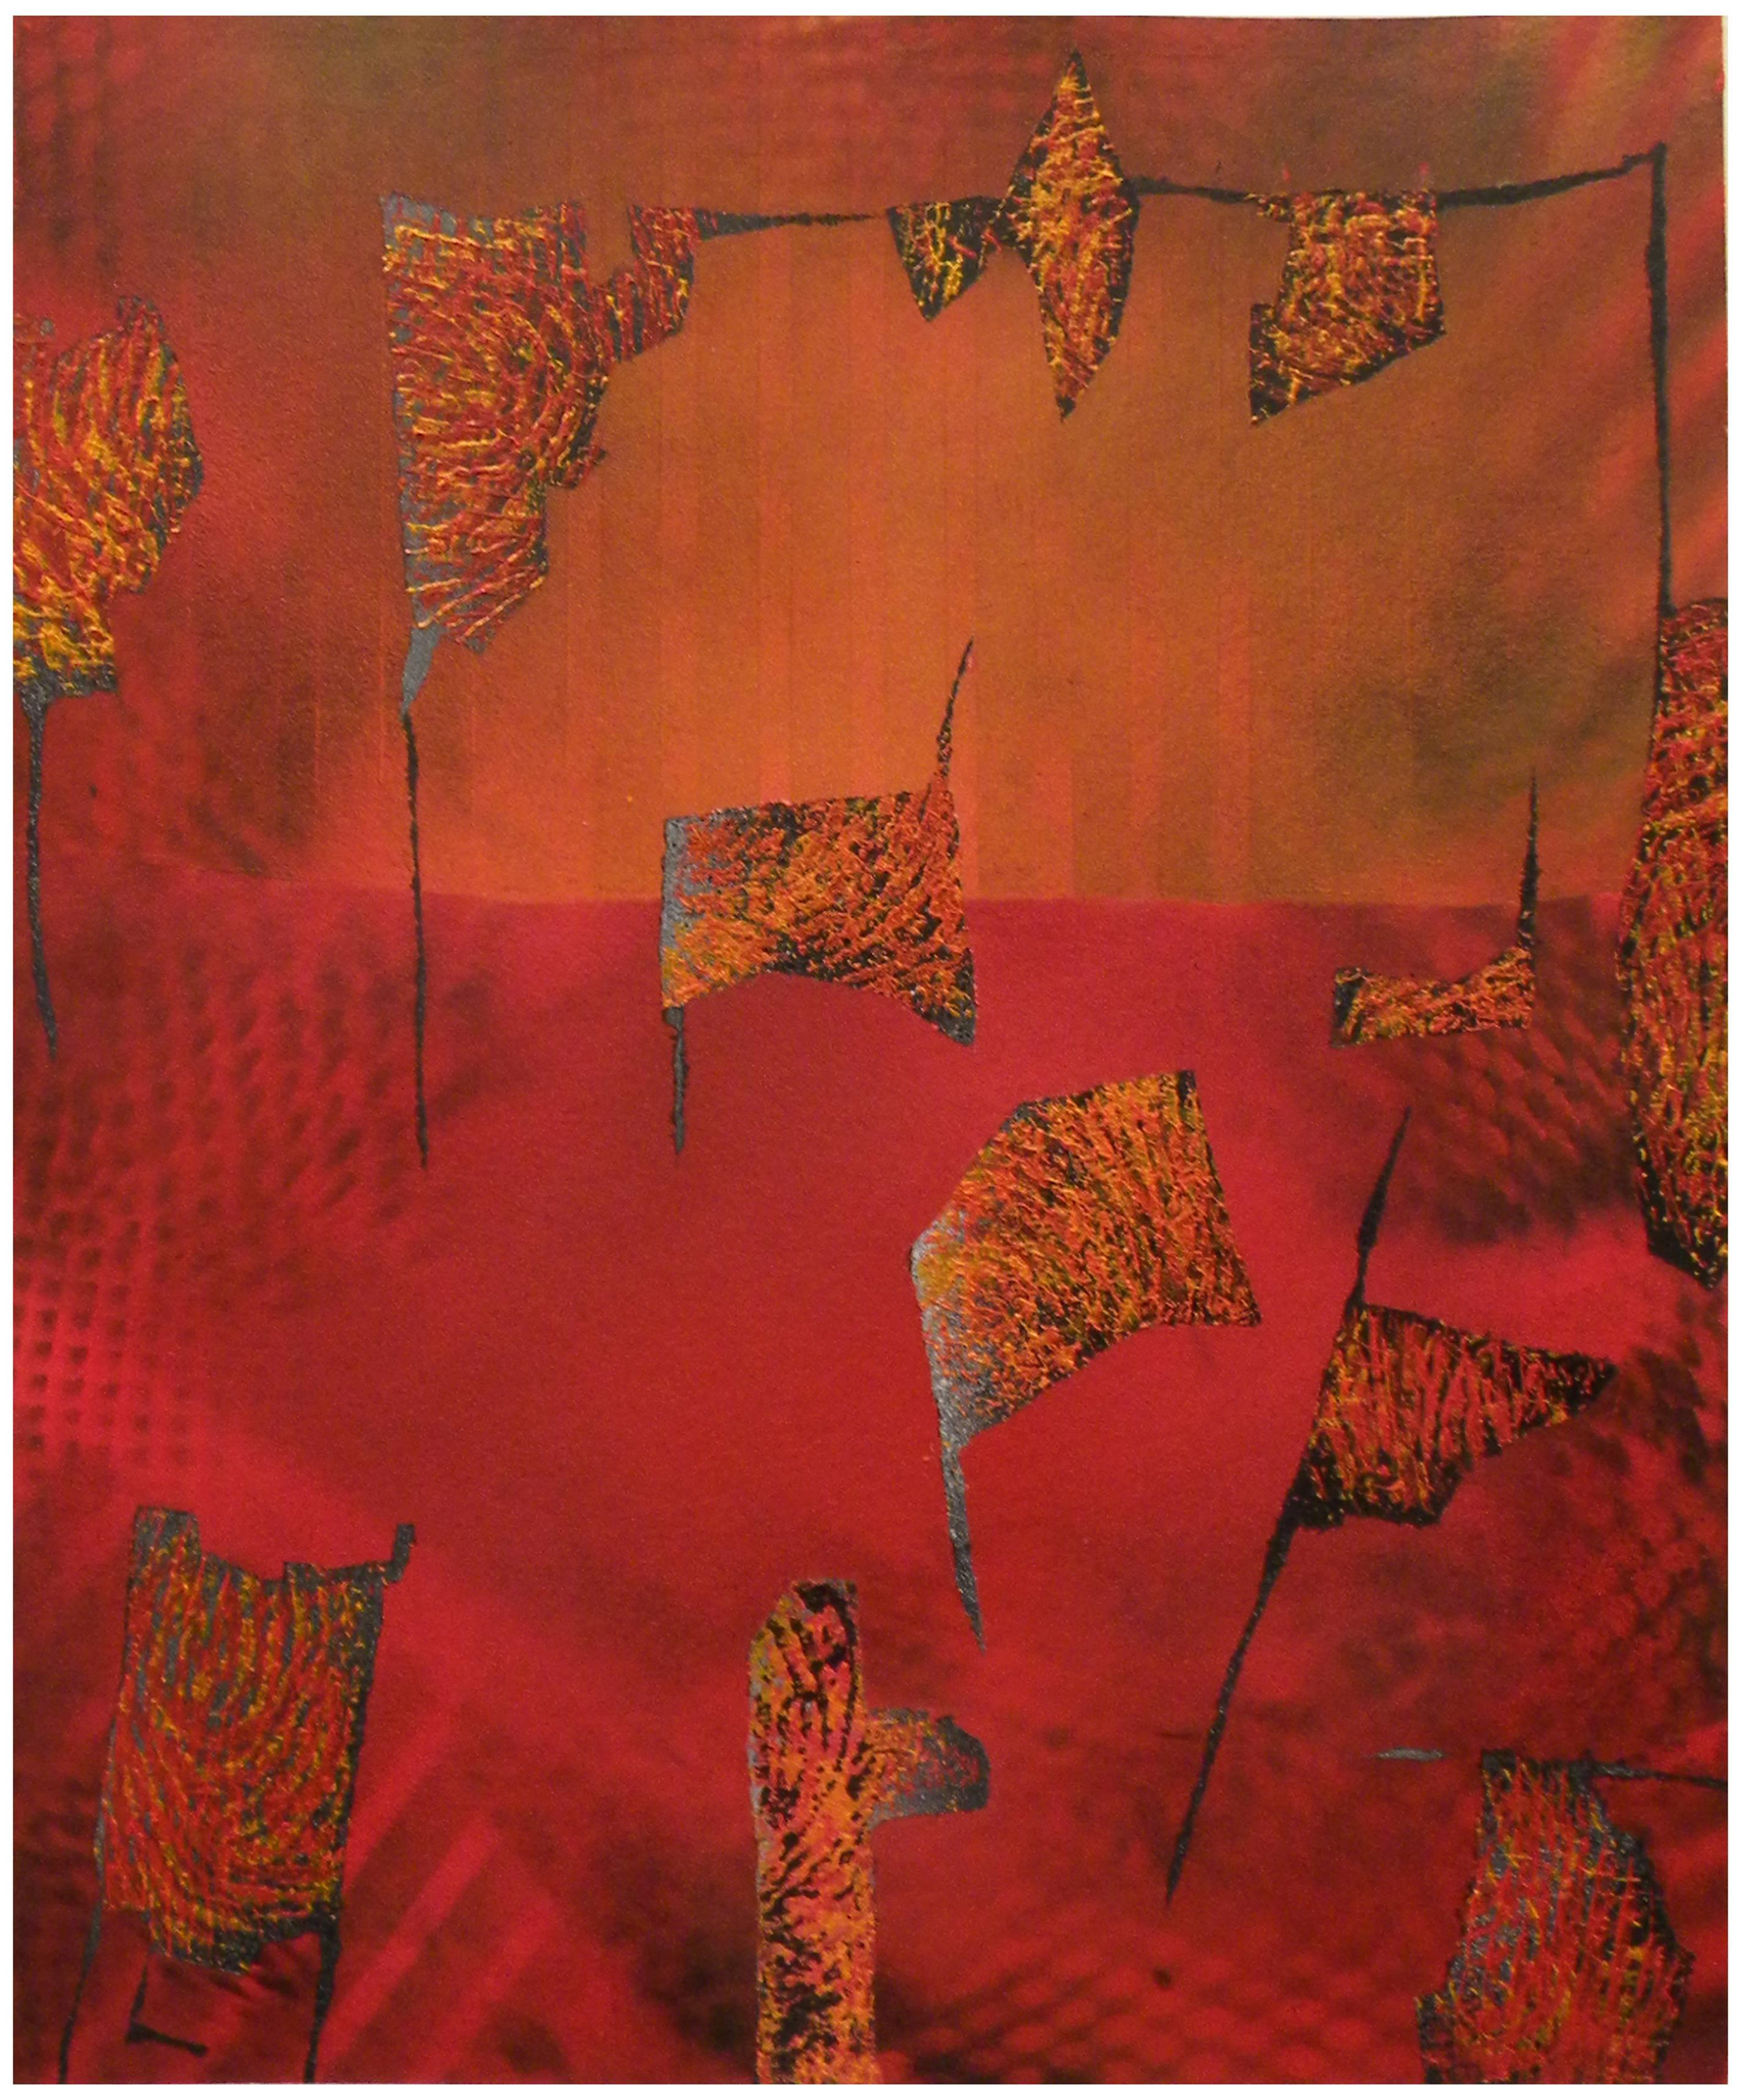 Jane Sangerman, Digit 46, 2016, Paper, Spray Paint, Acrylic Paint. Abstraction.